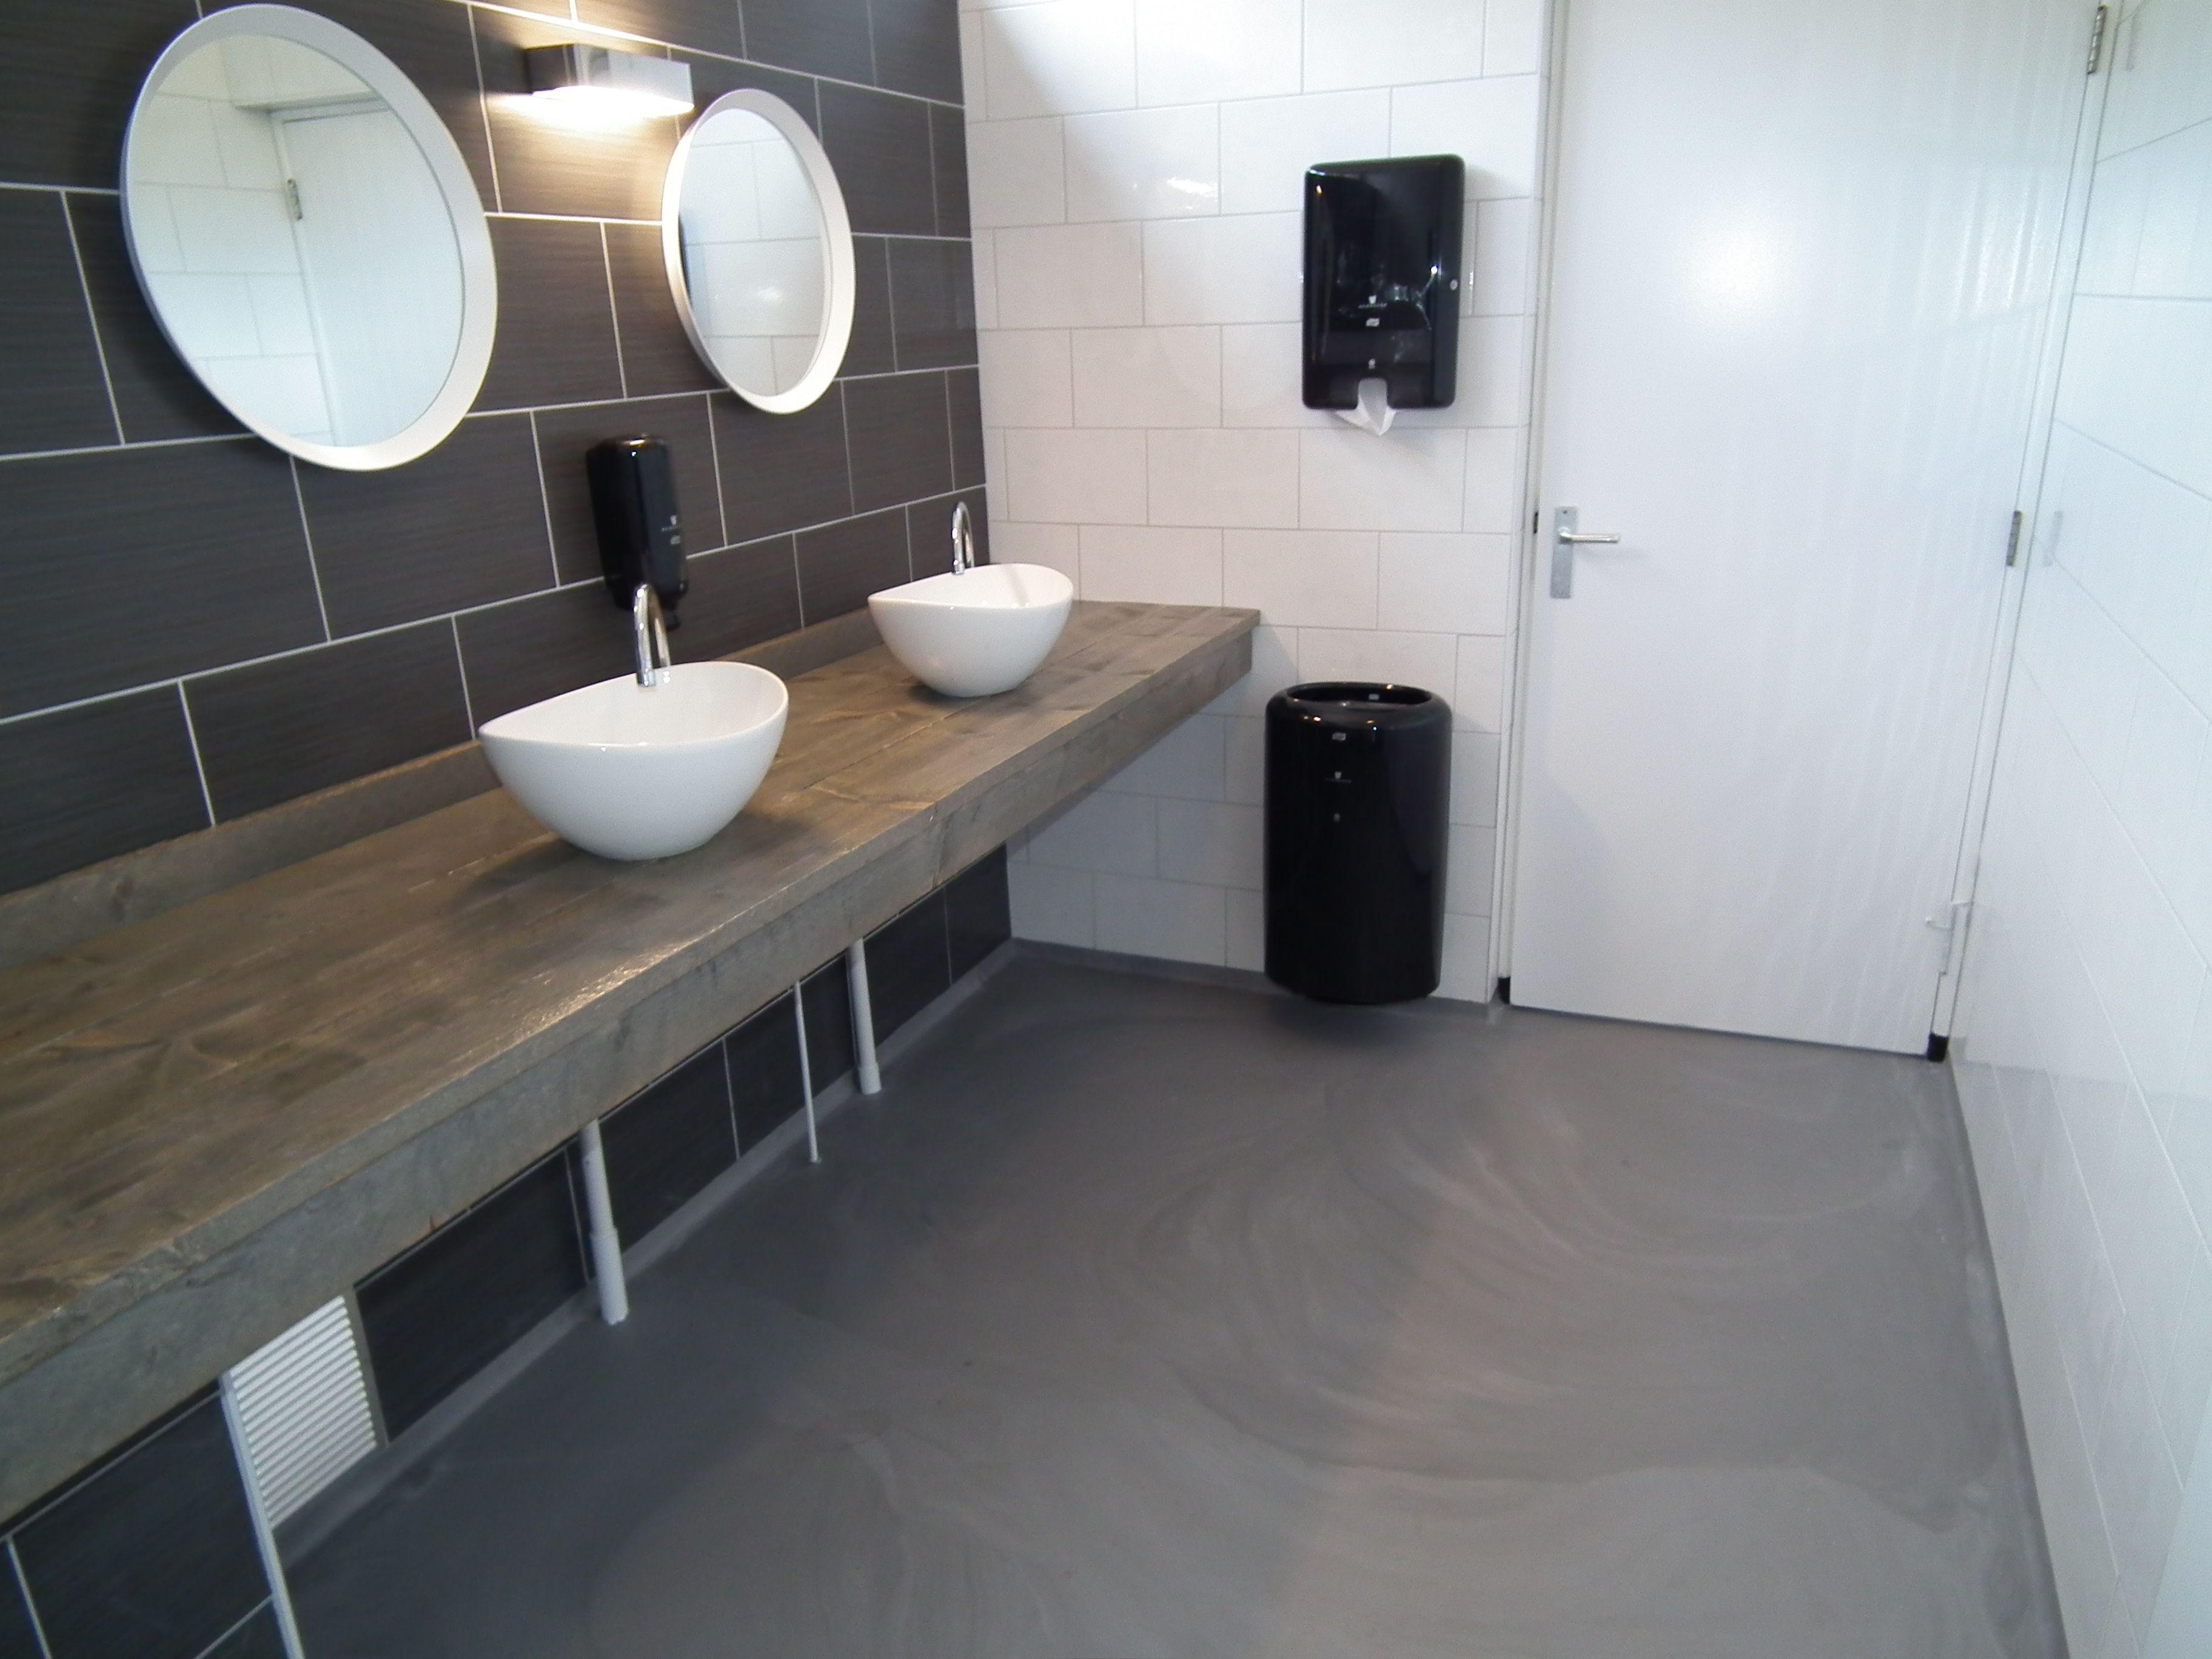 Pu gietvloer betonlook badkamer toiletgroep gietvloeren in 2019